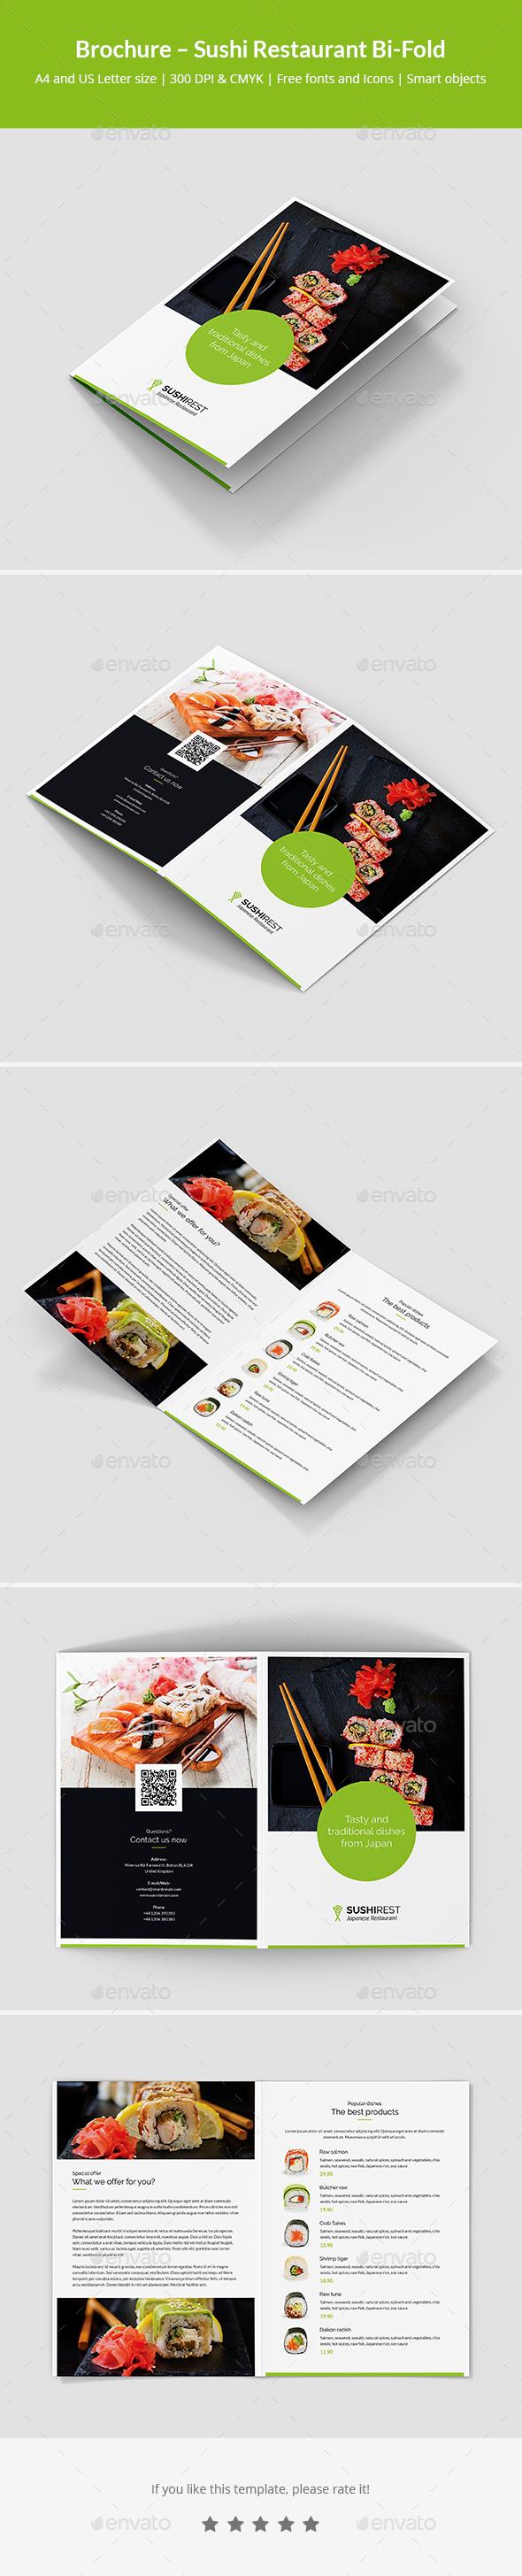 Brochure – Sushi Restaurant Bi-Fold - Informational Brochures